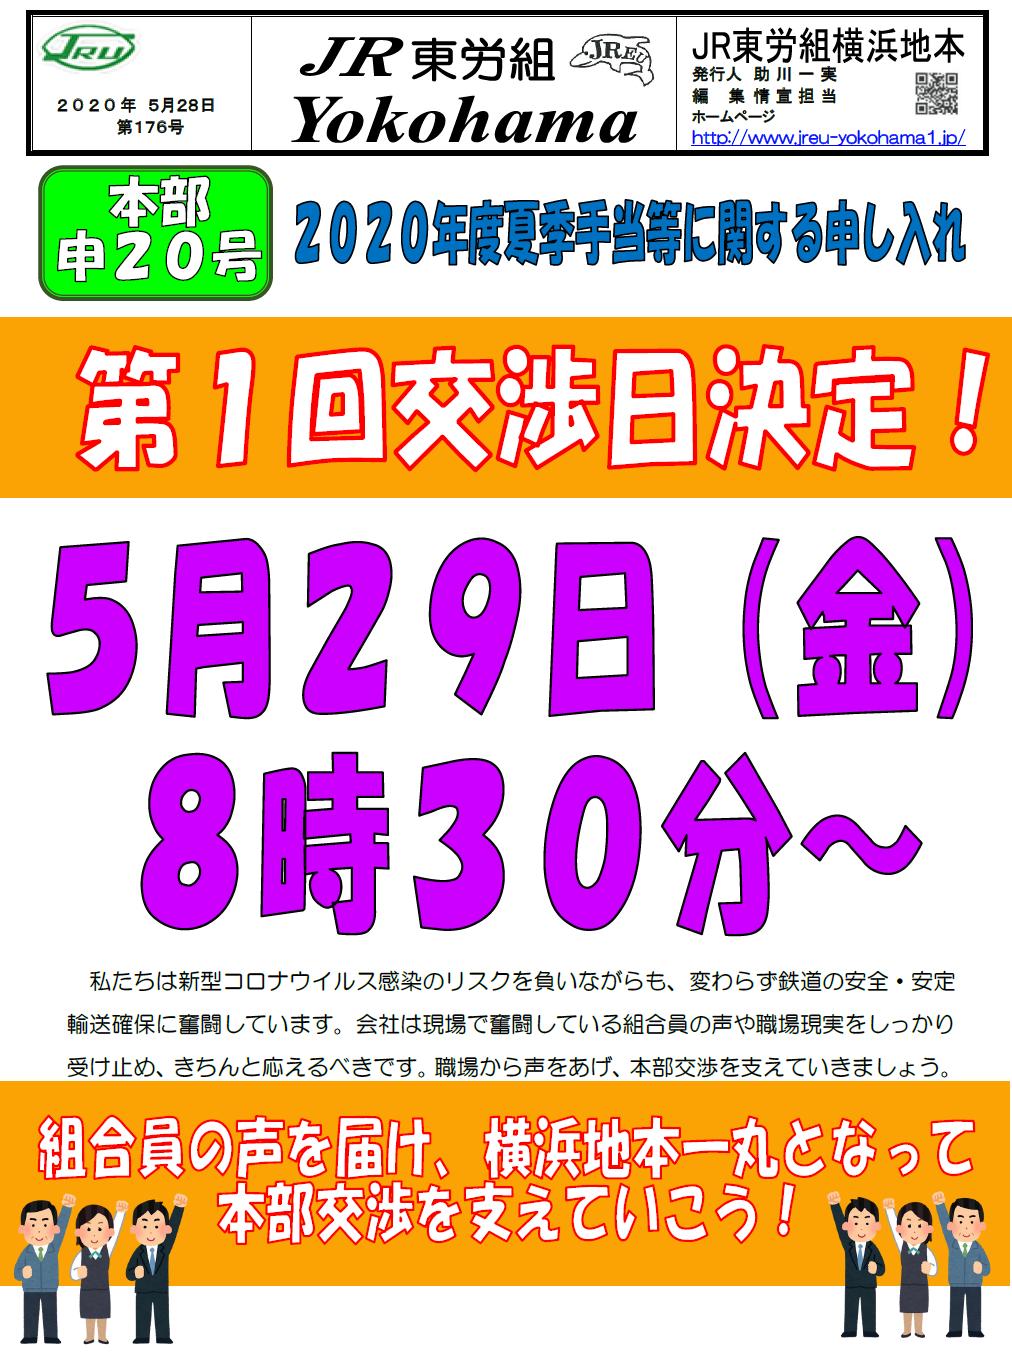 労働 組合 東日本 輸送 サービス Jr